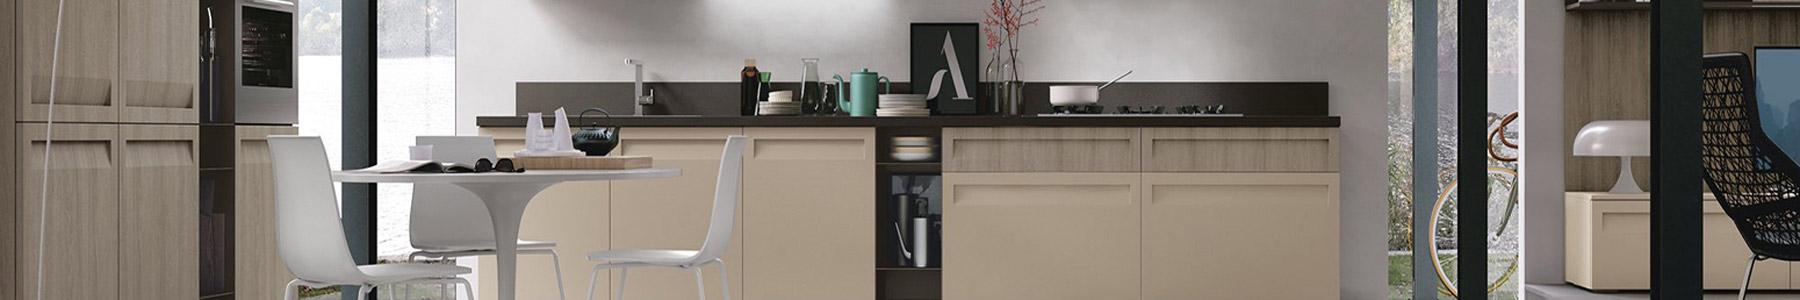 FAQ - Eurolife Kitchens and Wardrobes Designs Sydney